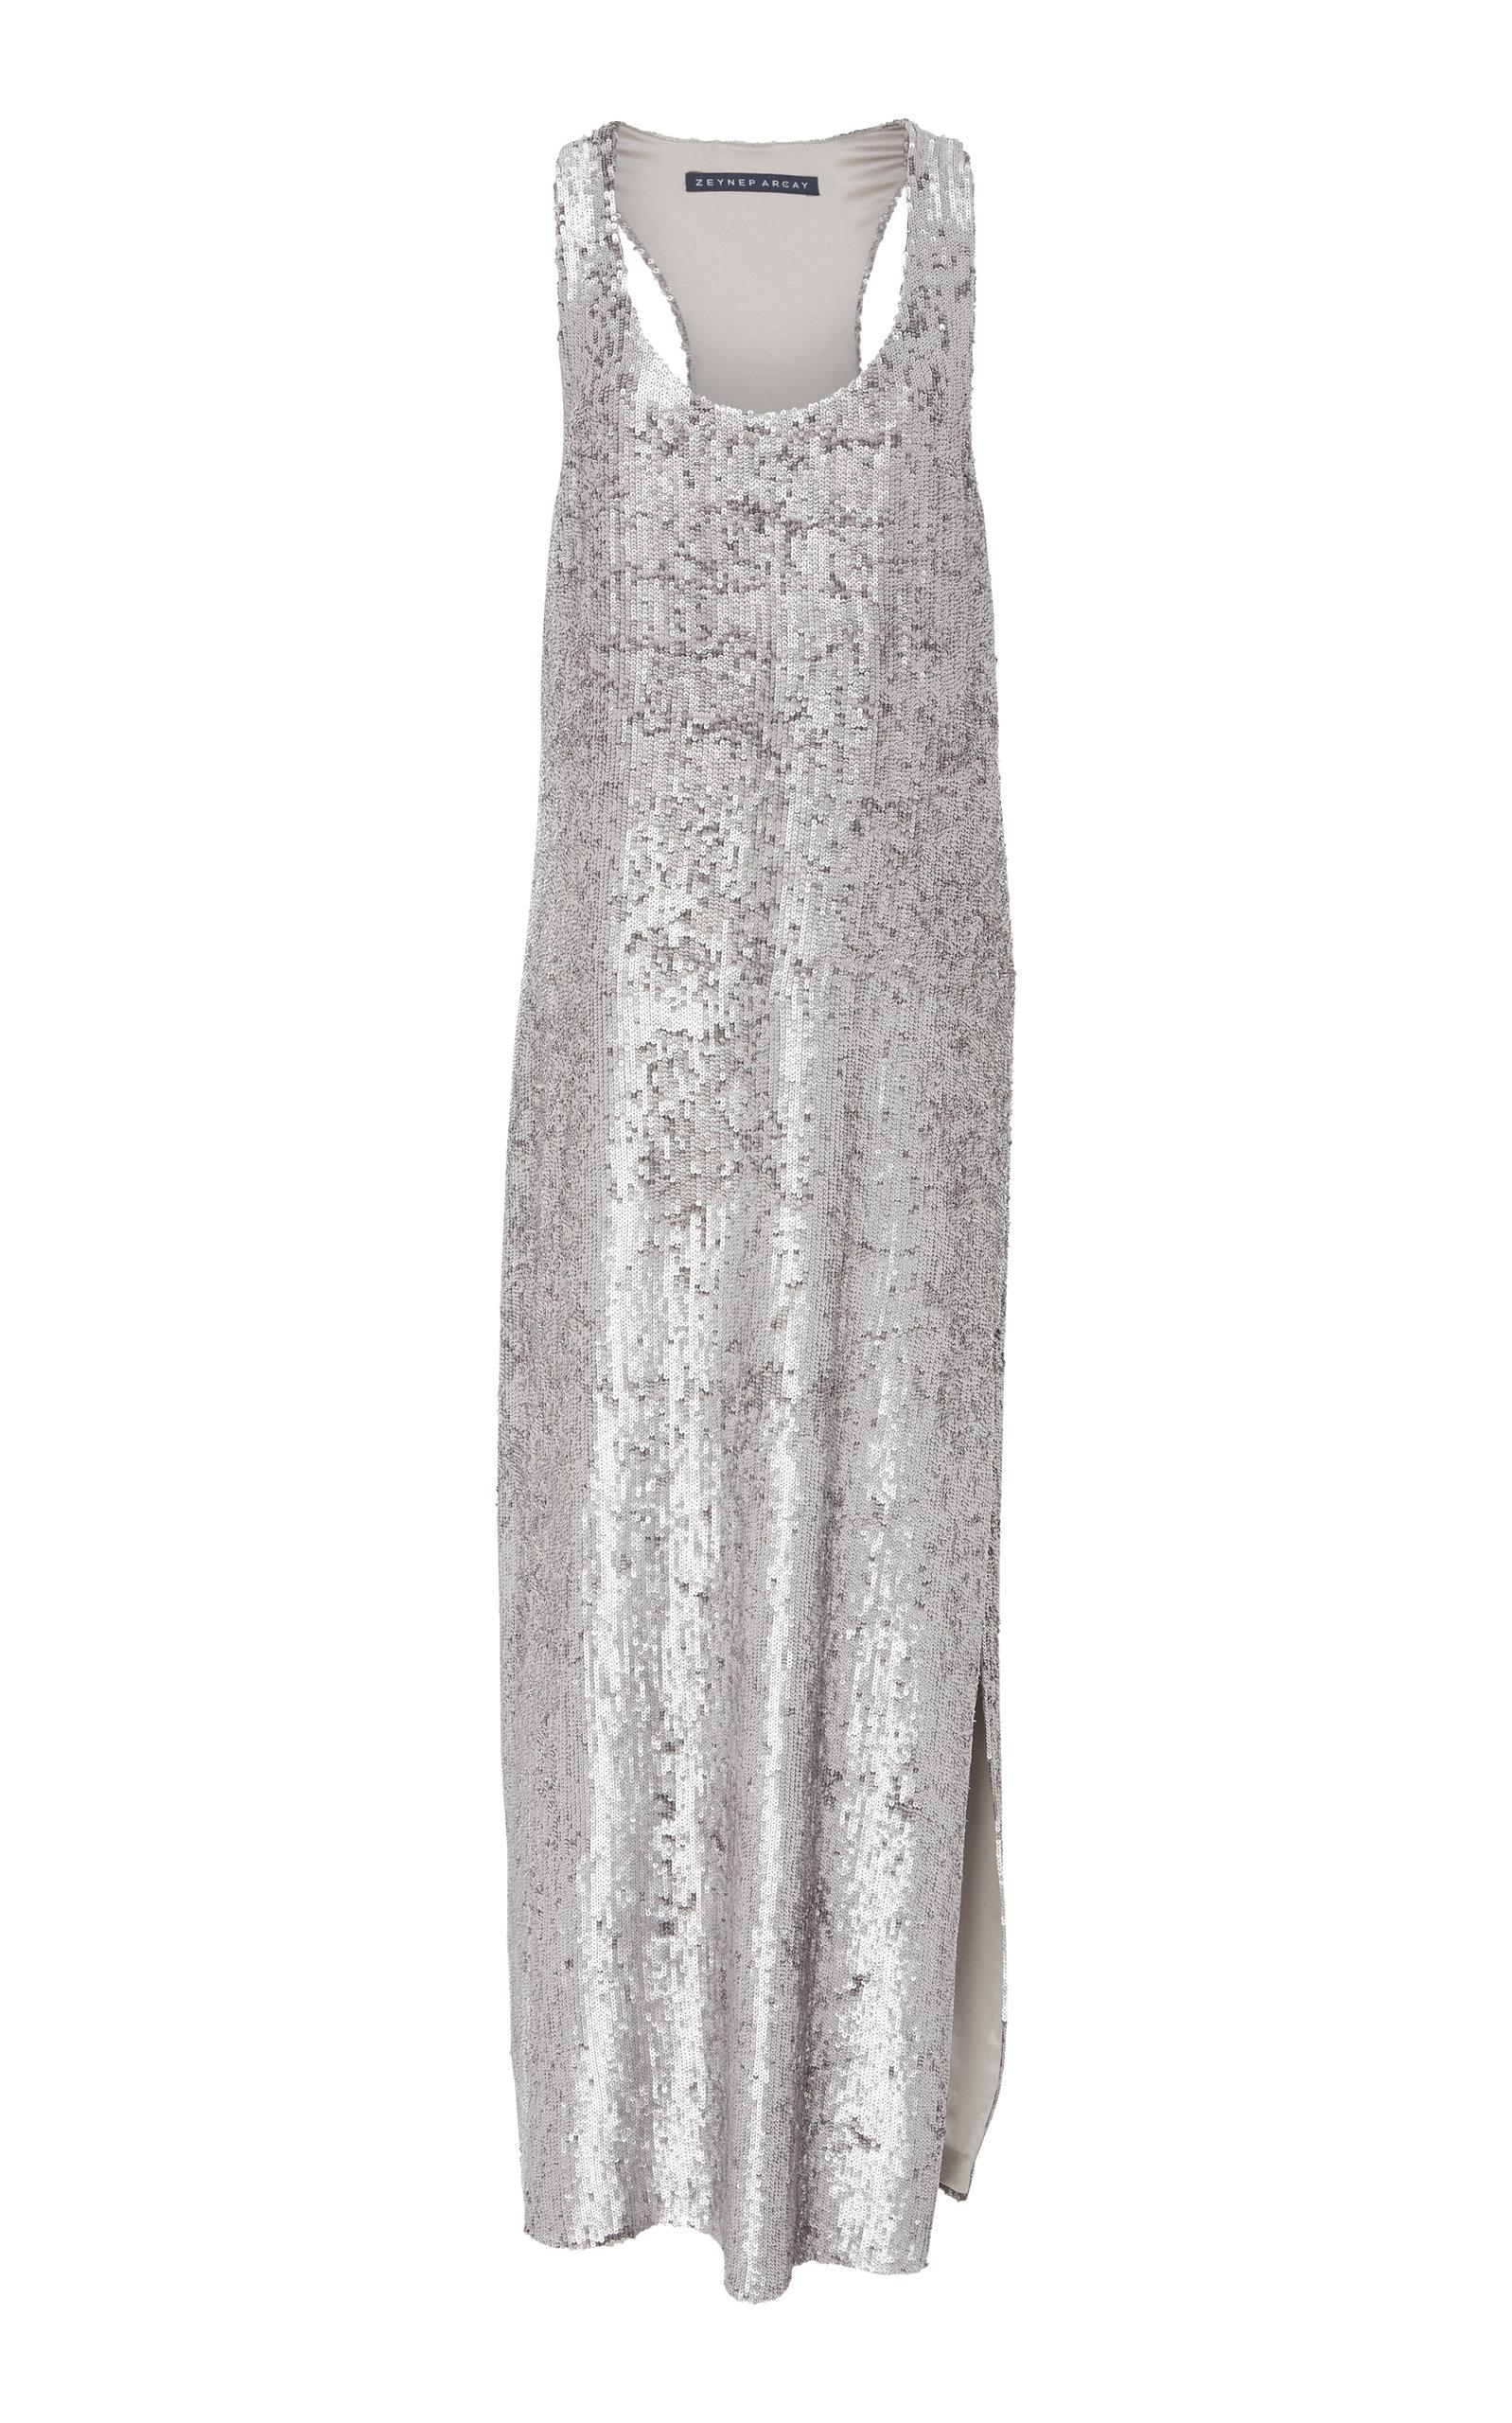 ZEYNEP ARCAY SEQUIN TANK DRESS